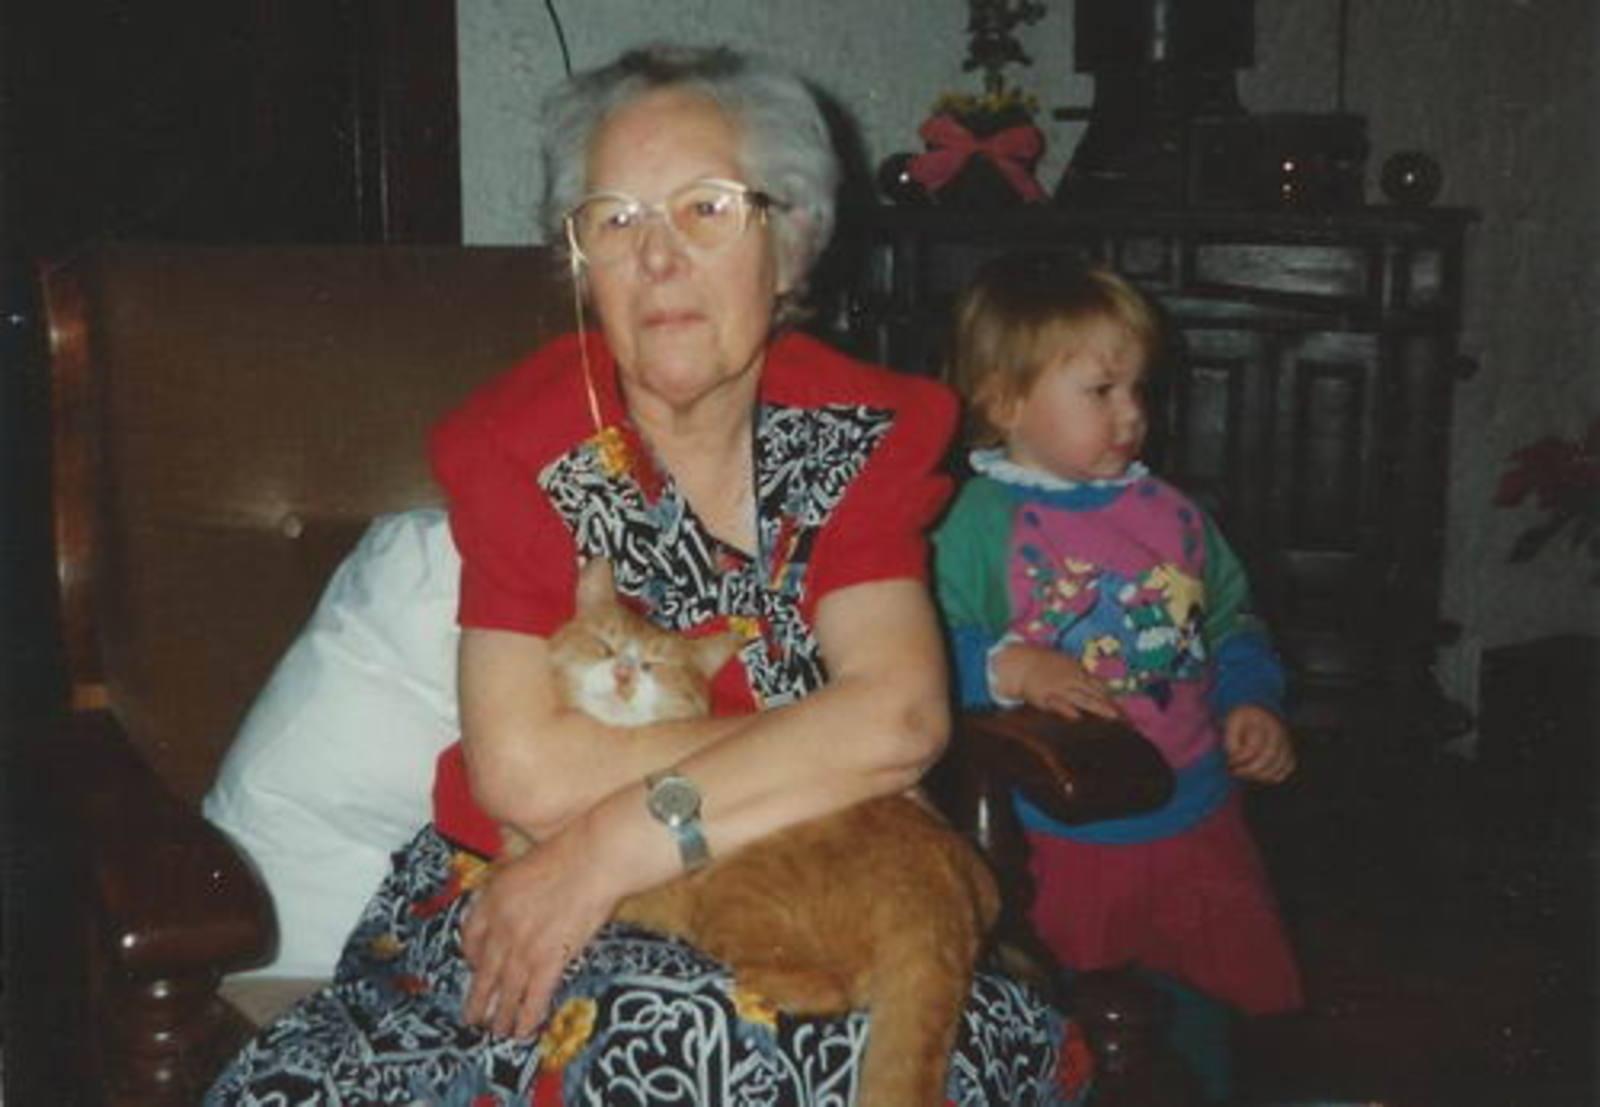 Bliek Toon 1914 1991 vrouw Helena vd Blom binnen in Luie Stoel